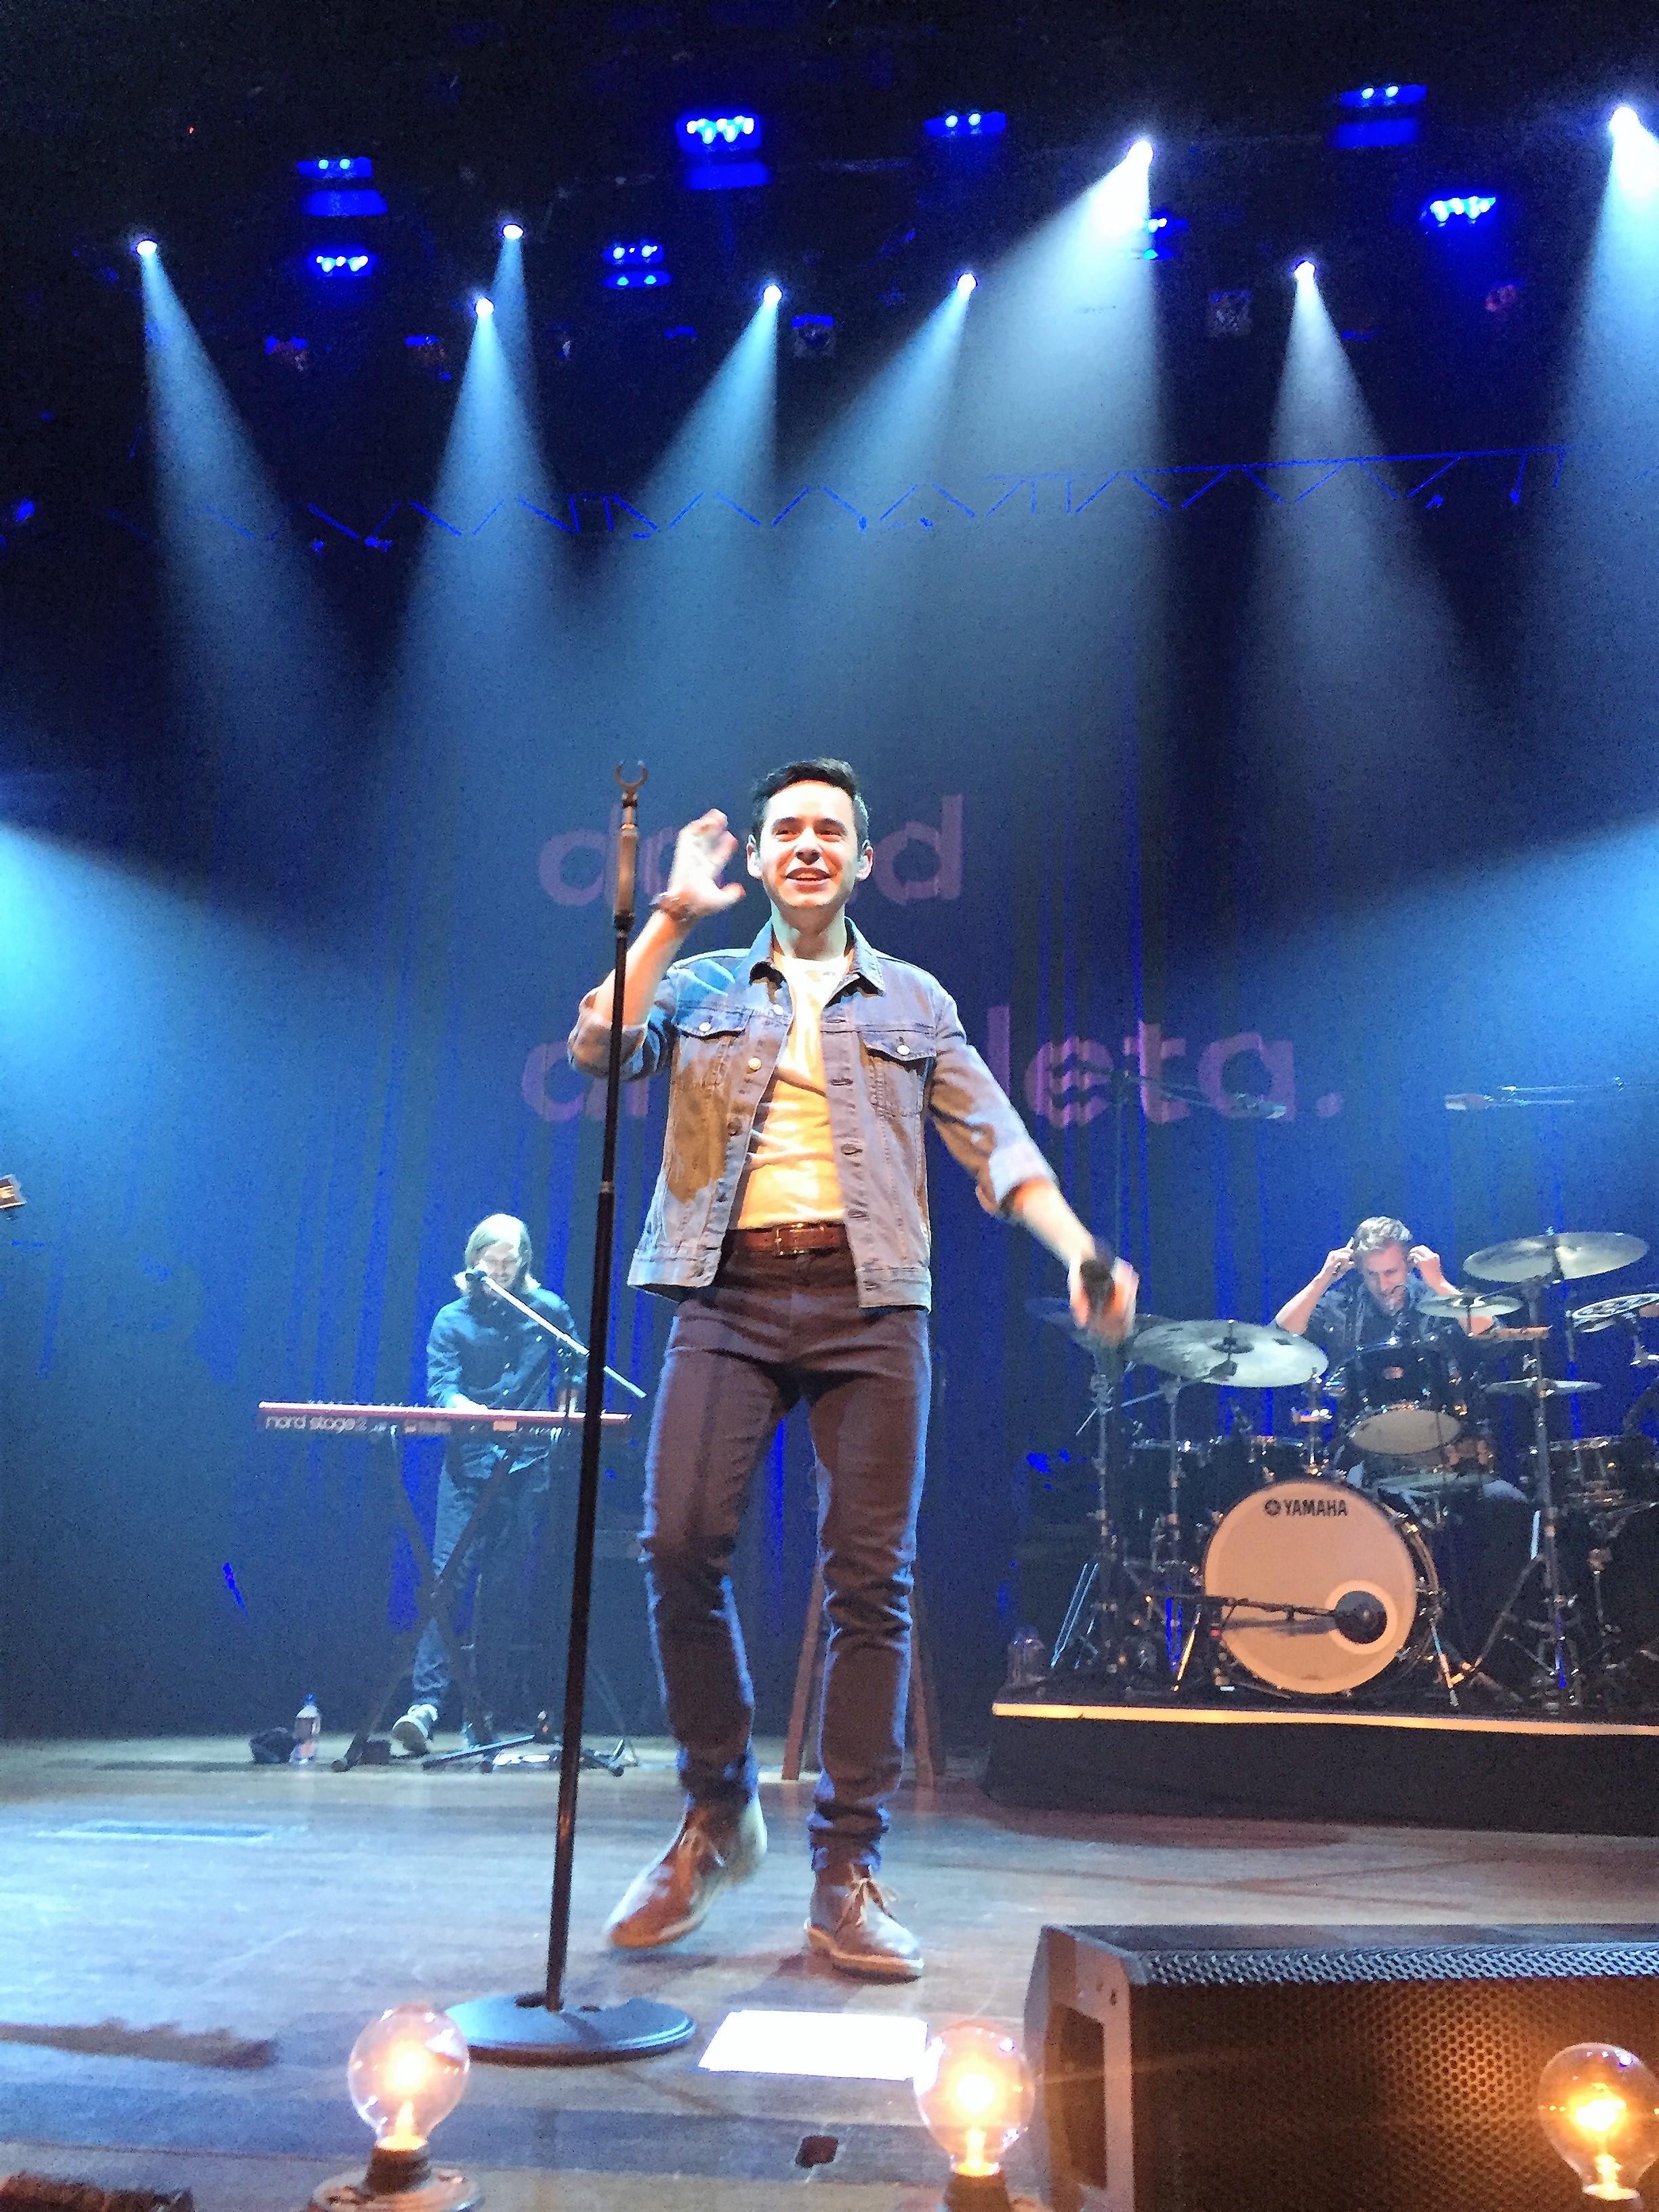 David Archuleta walking onstage in Franklin Tennessee